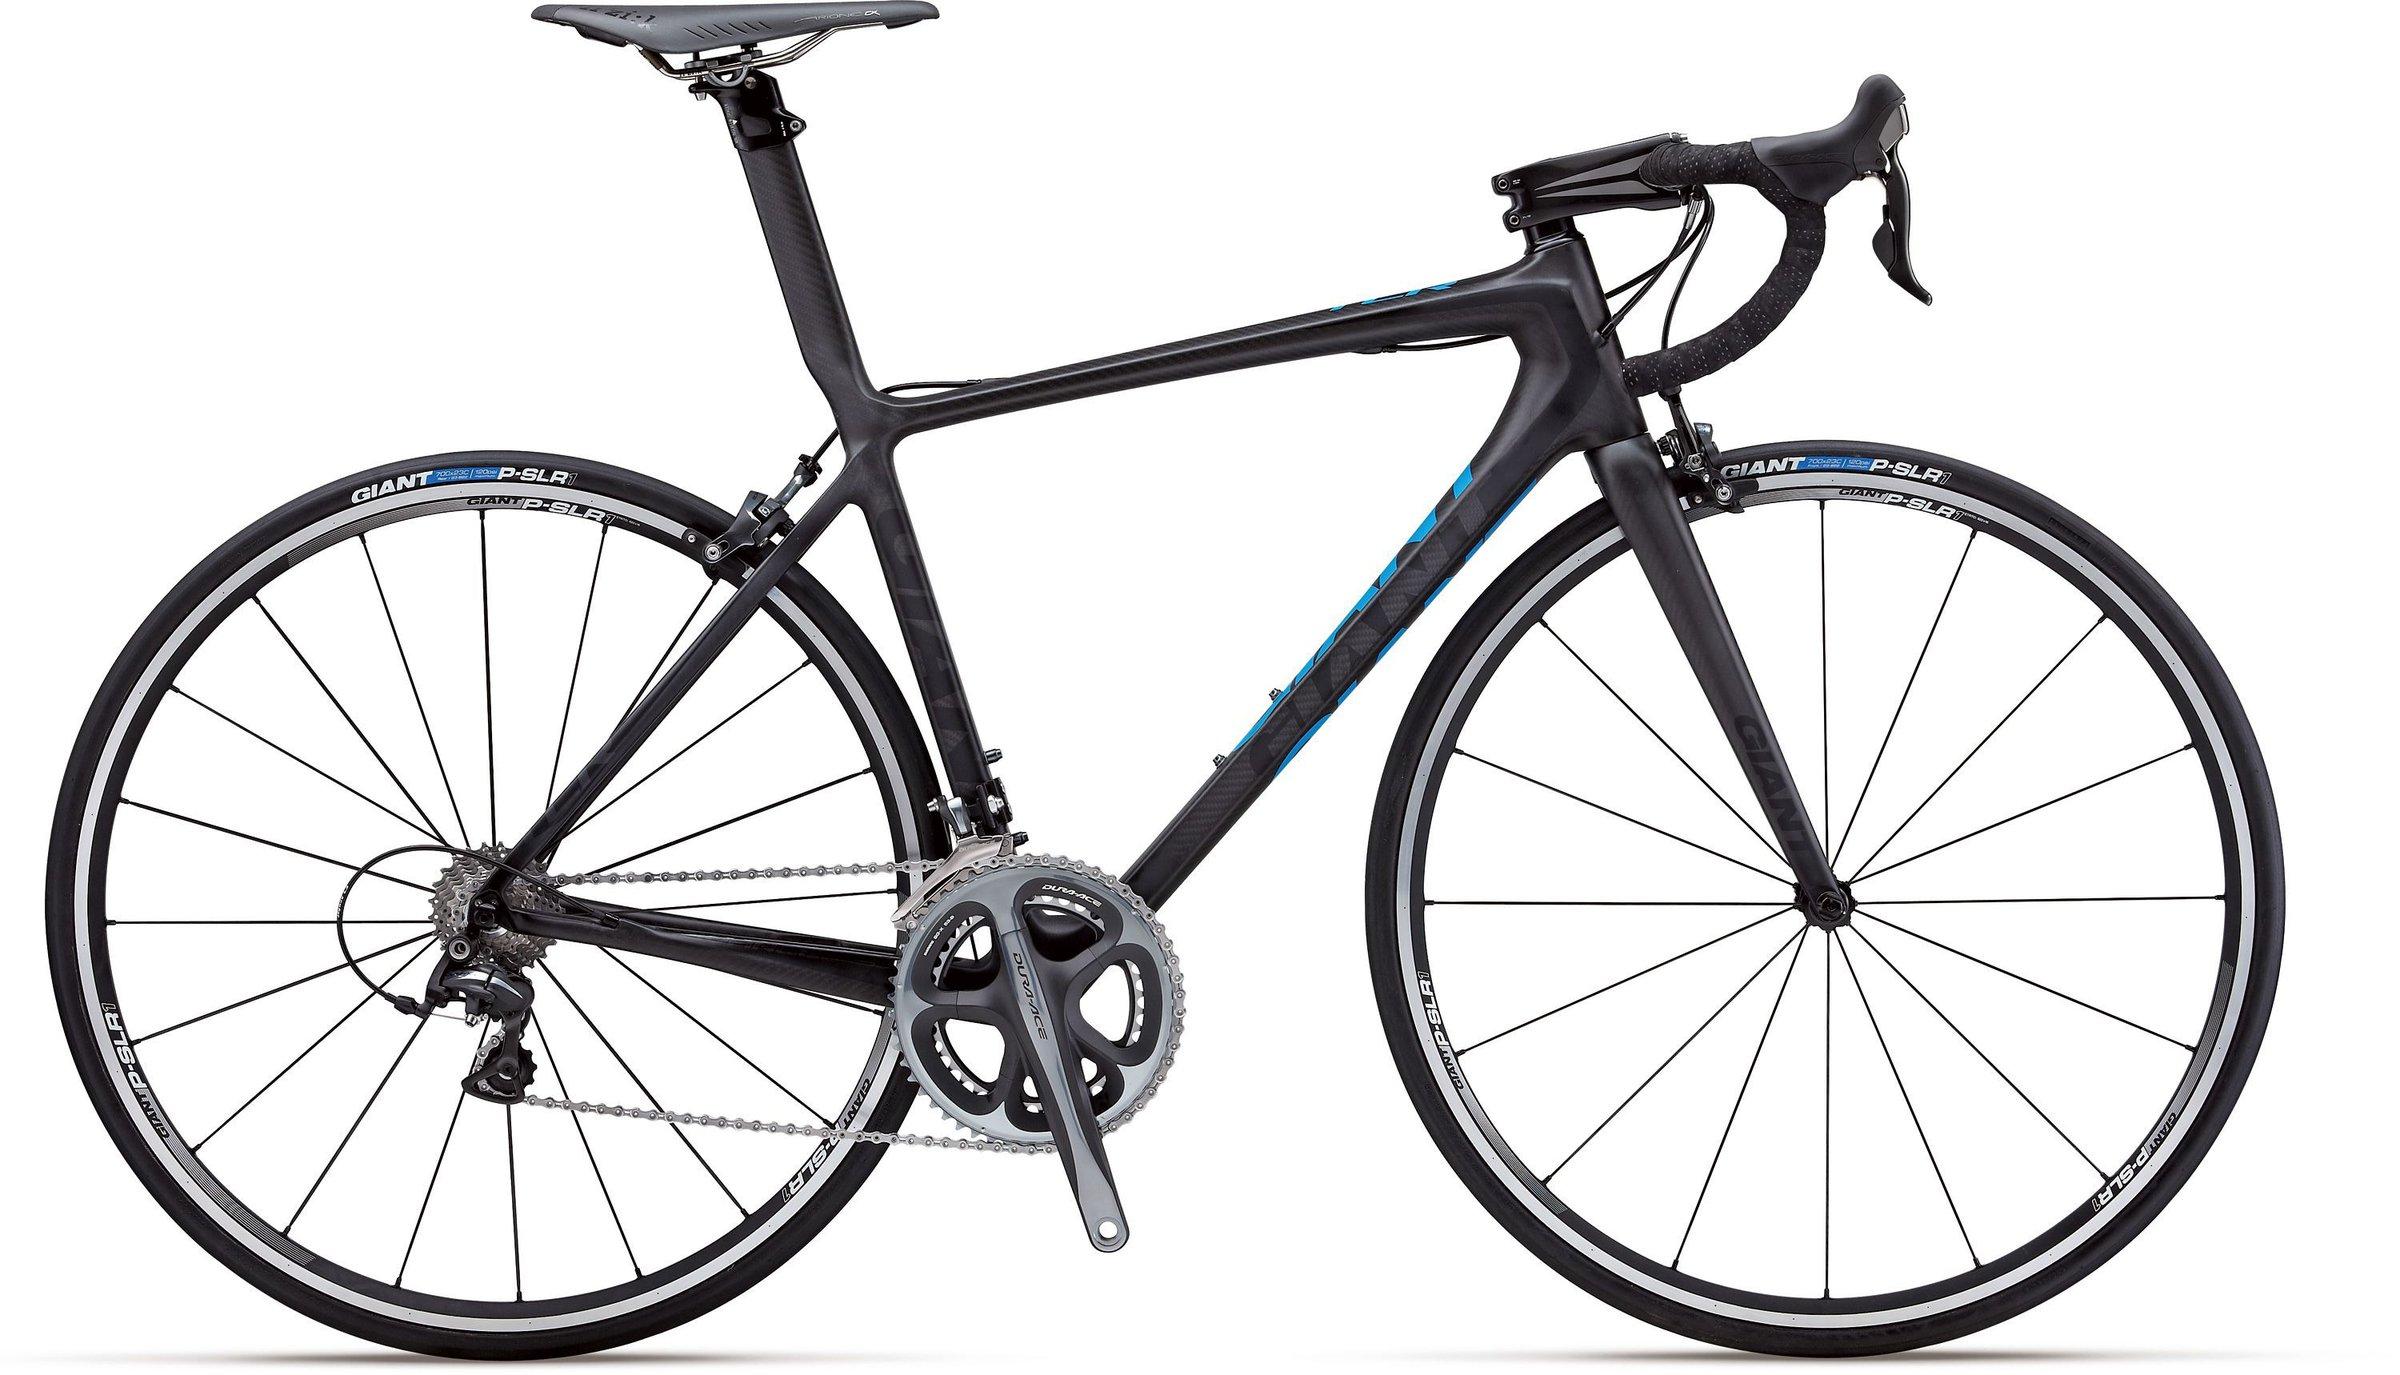 1a7c98dab8e Giant TCR Advanced SL 1 - Wheel World Bike Shops - Road Bikes ...